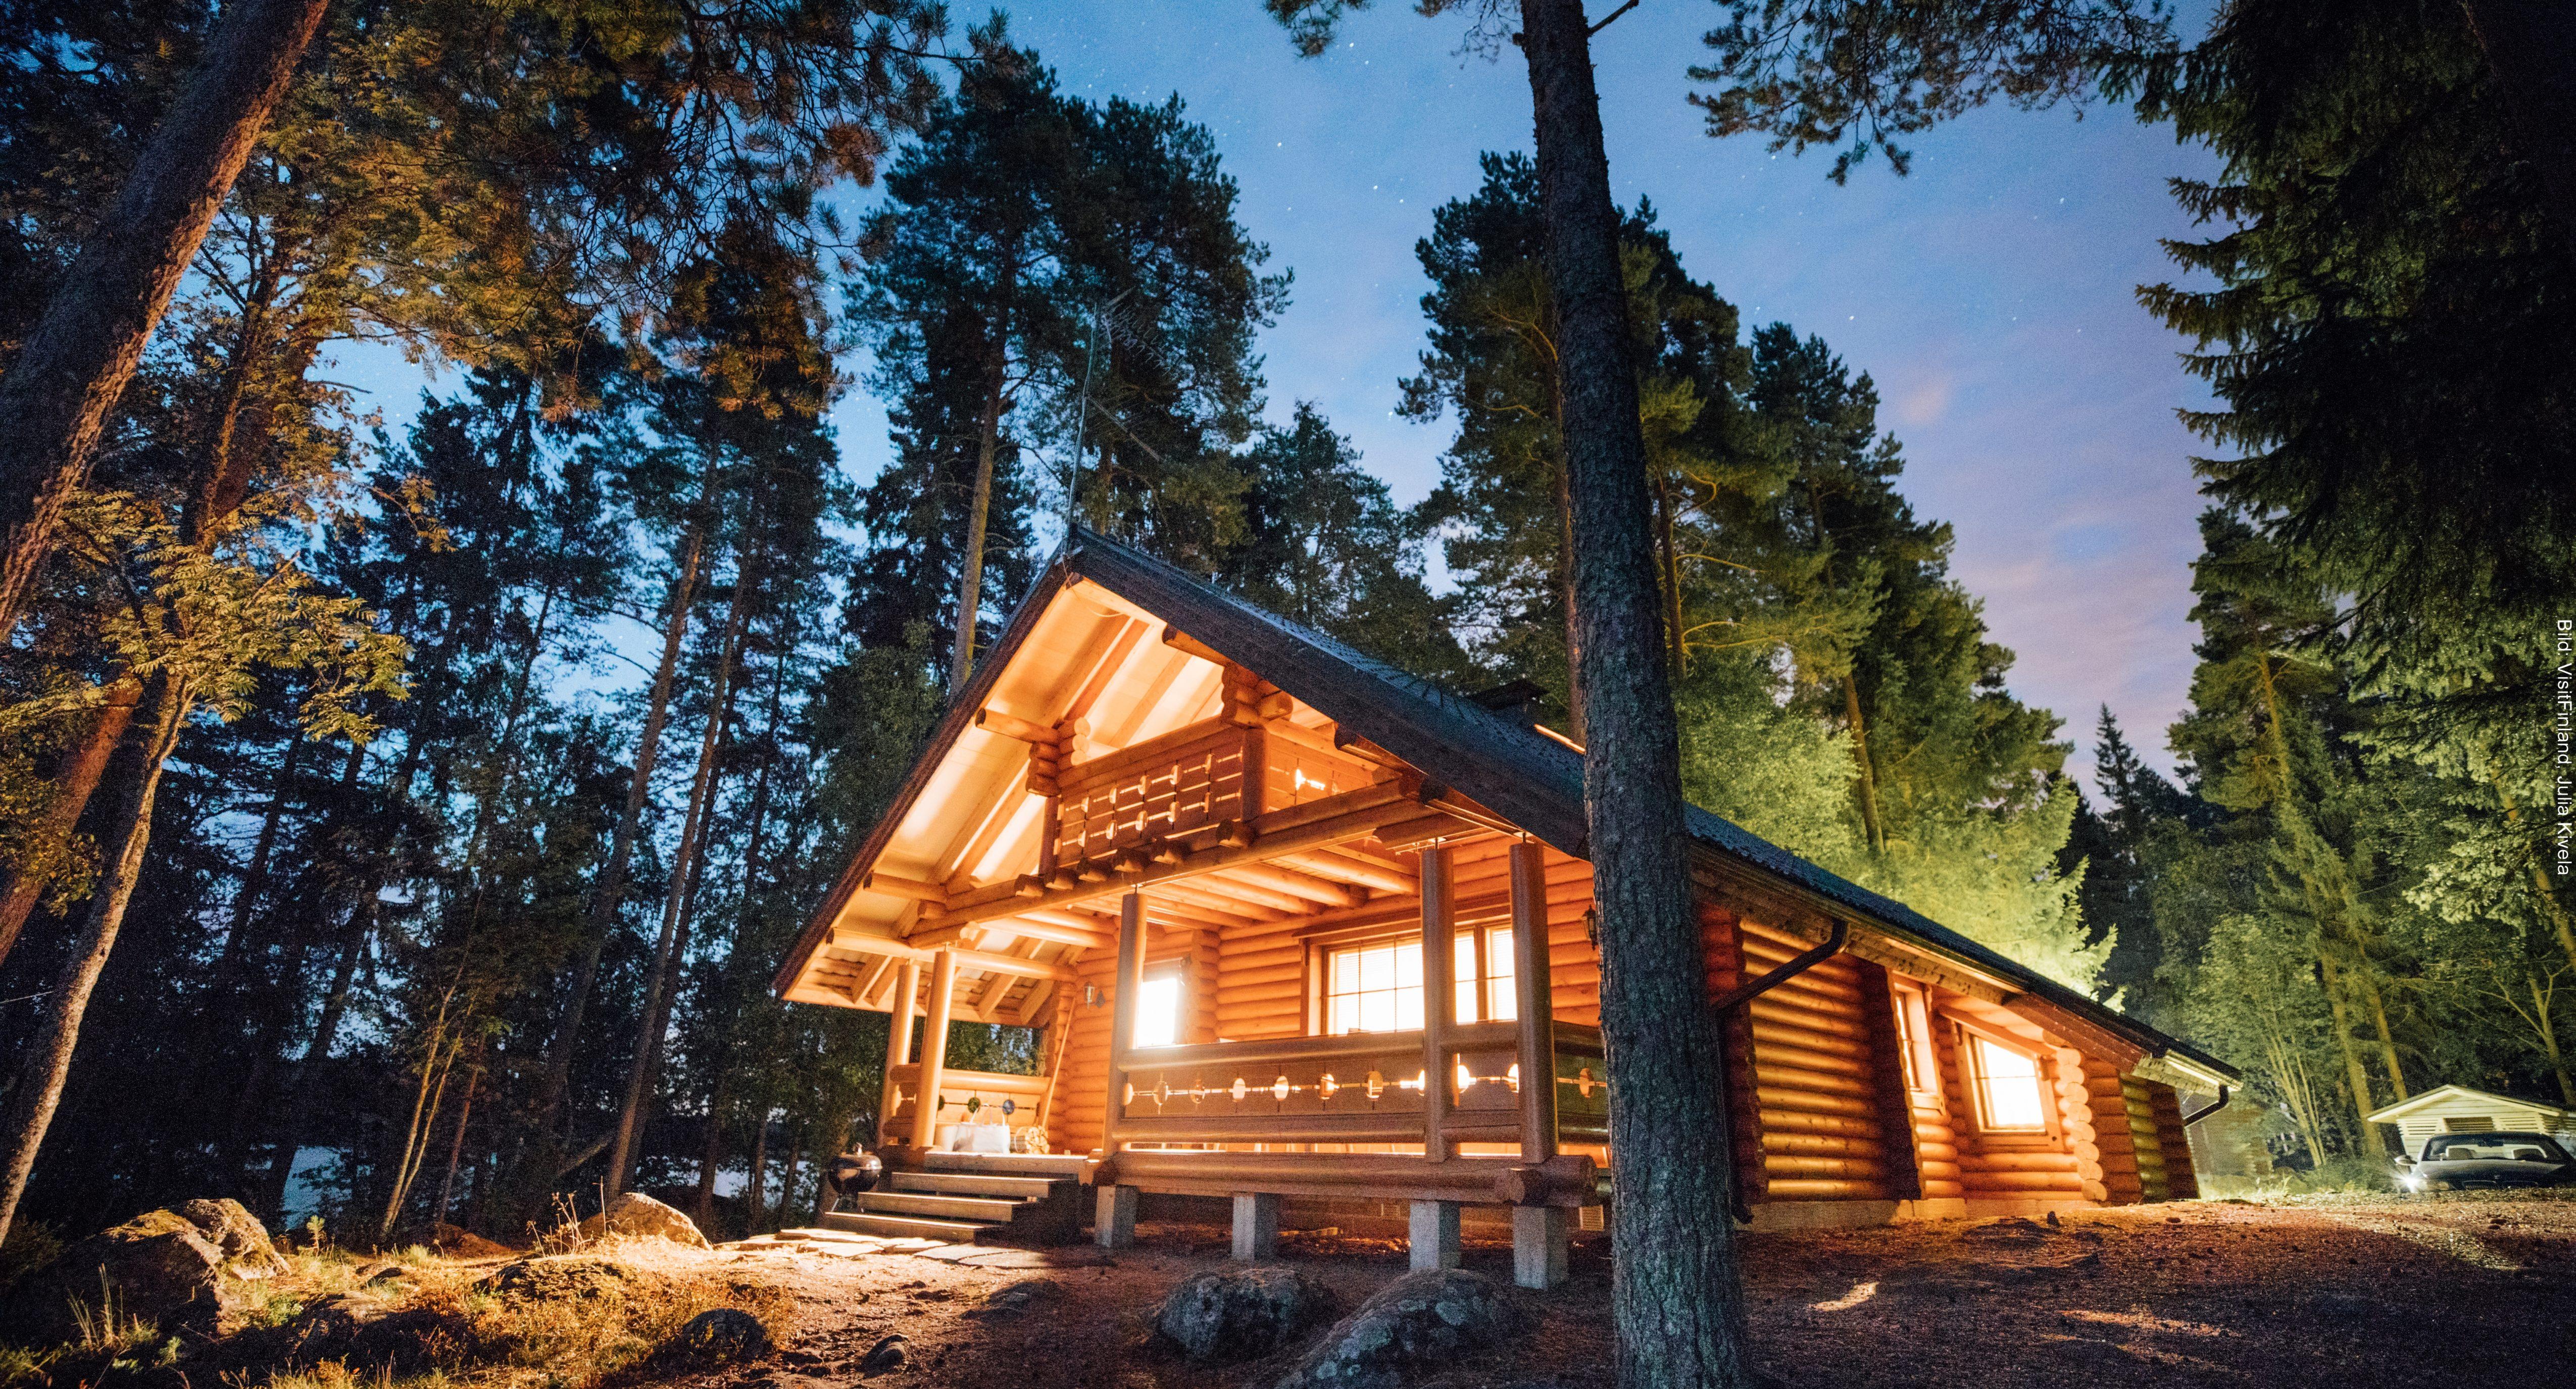 Fähre Finnland Blockhütte